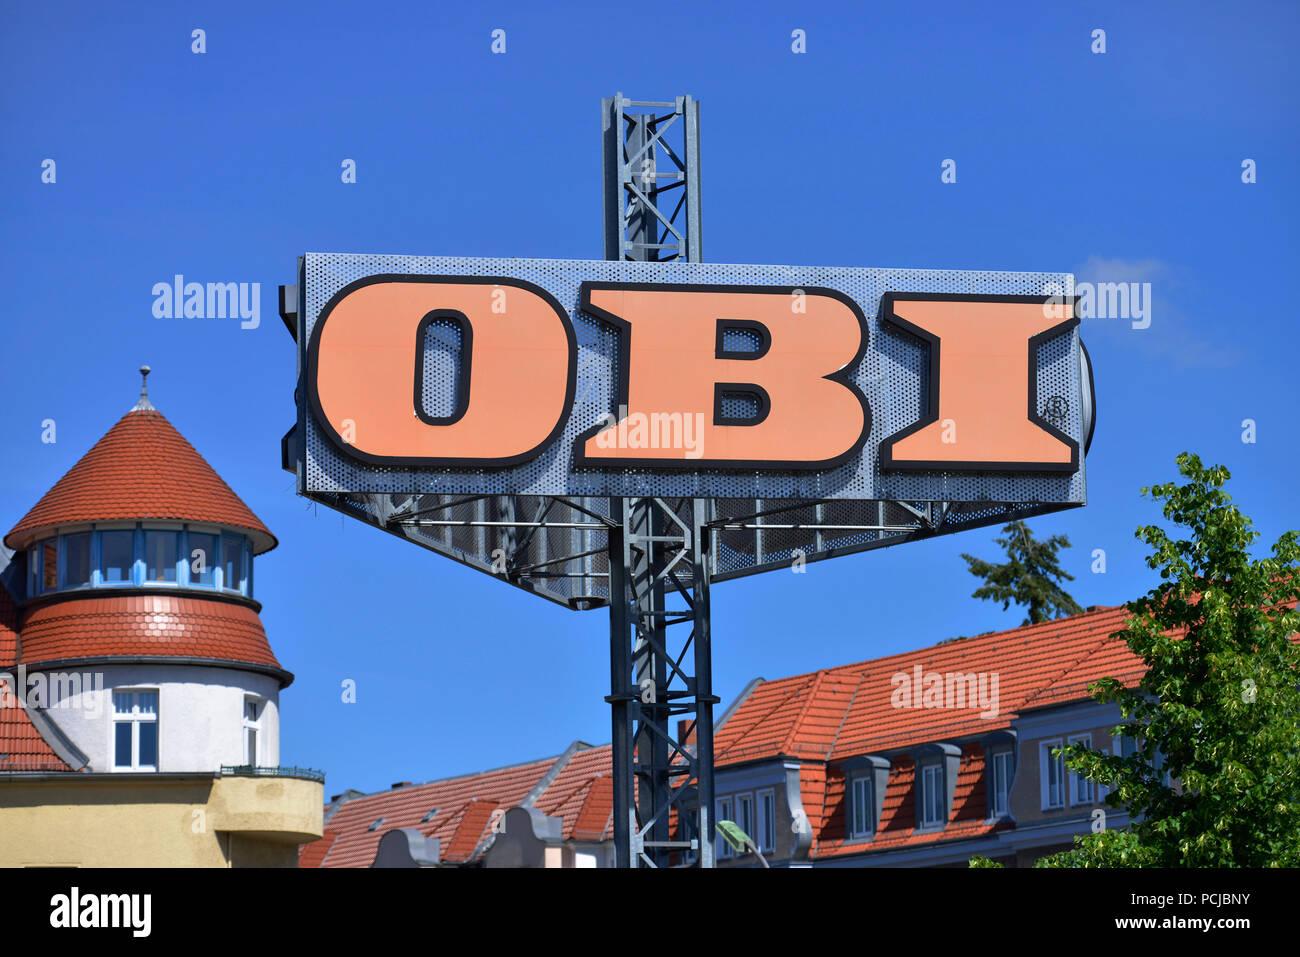 obi market stock photos obi market stock images alamy. Black Bedroom Furniture Sets. Home Design Ideas